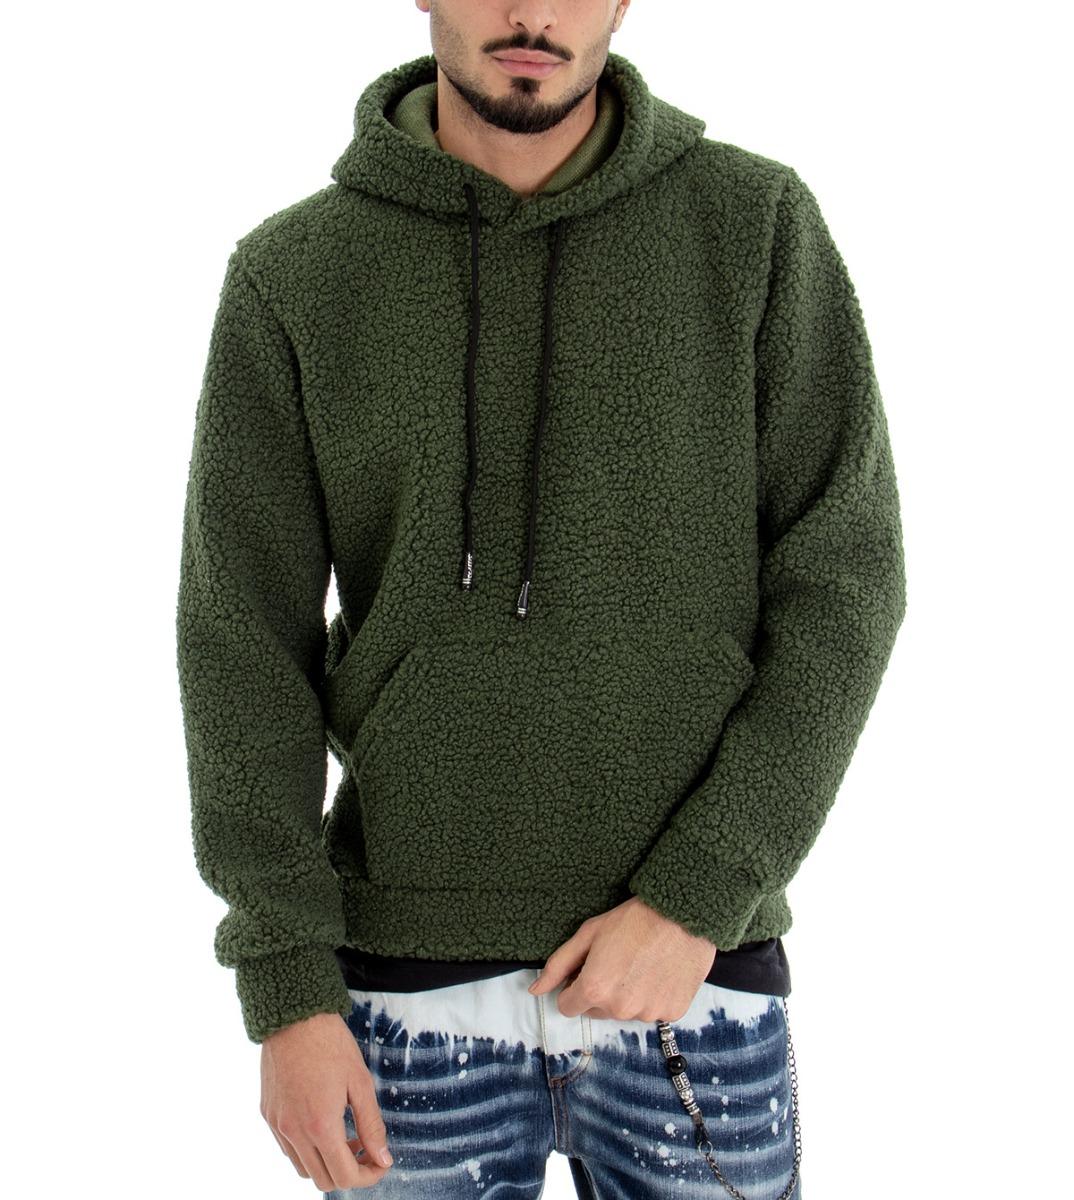 Sweat Hommes Teddy Fourrure Synthetique Vert